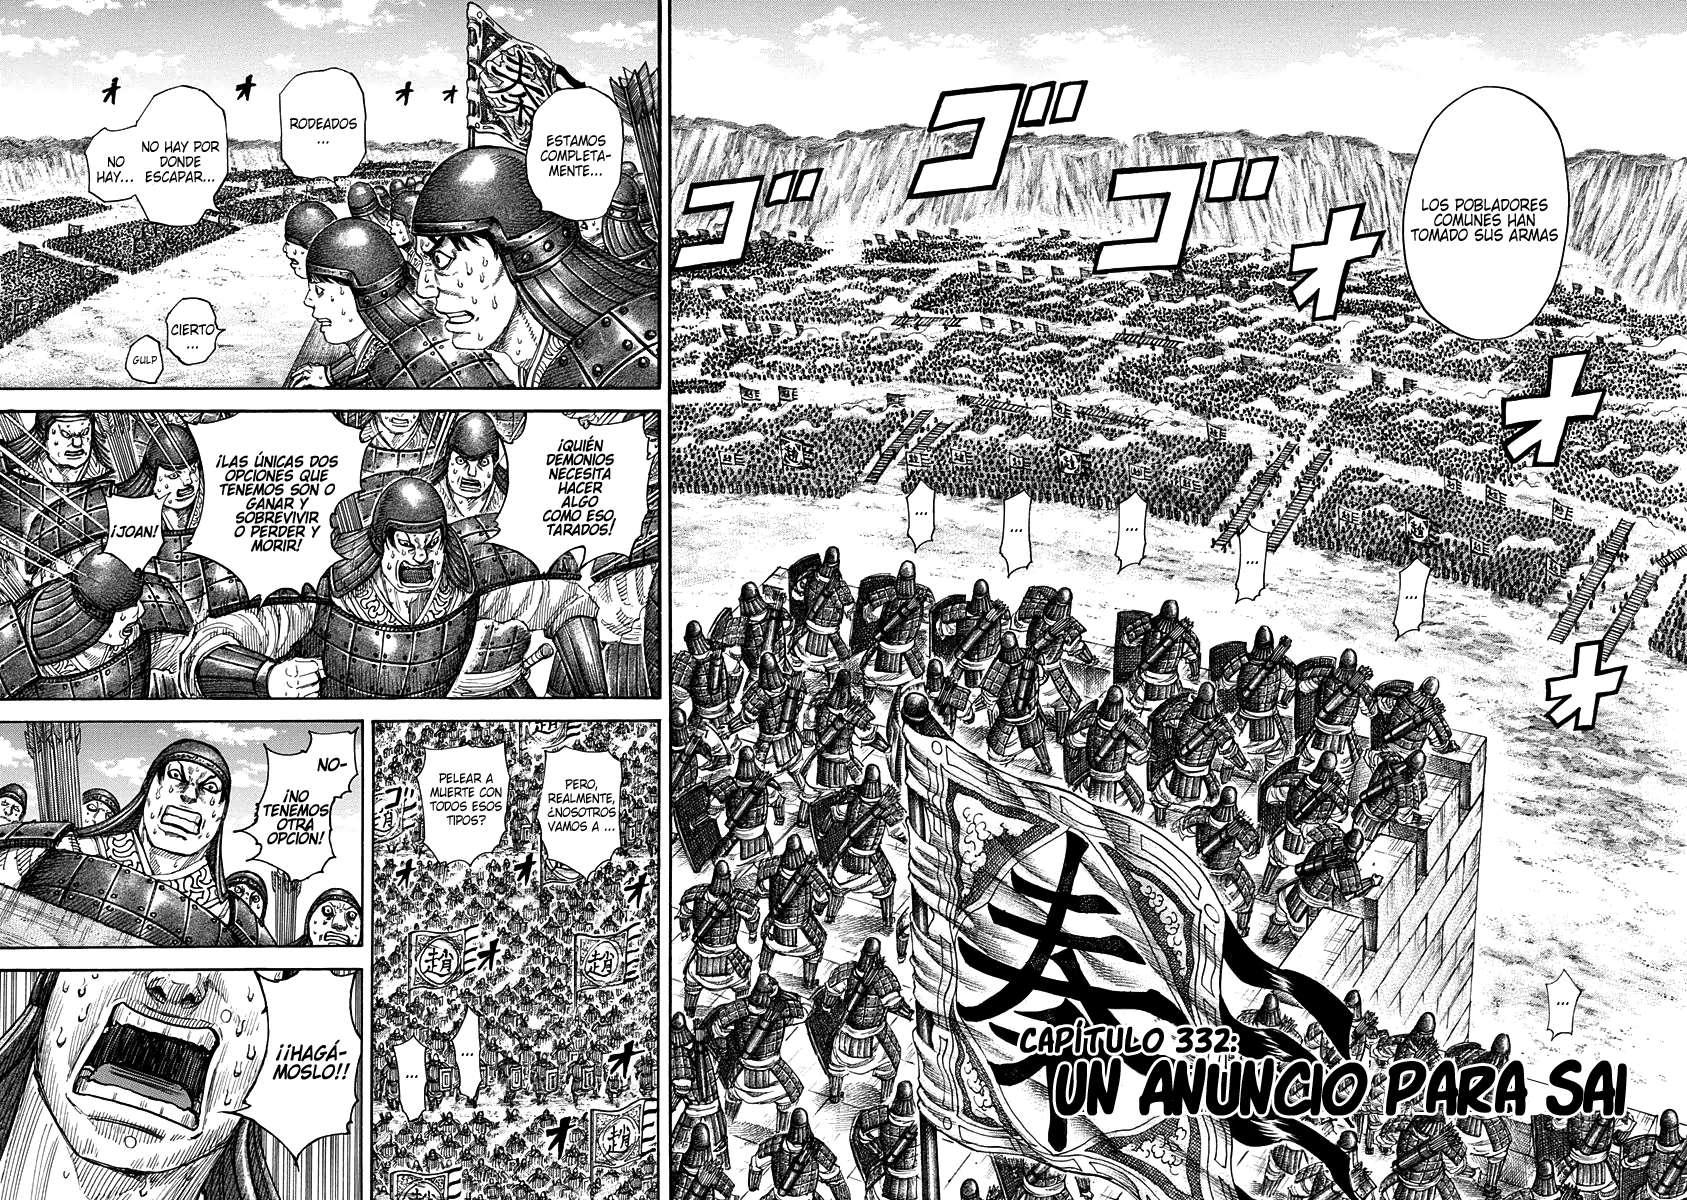 http://c5.ninemanga.com/es_manga/19/12307/360915/a79c4278ae42433a1764ded1aa0e6dac.jpg Page 2